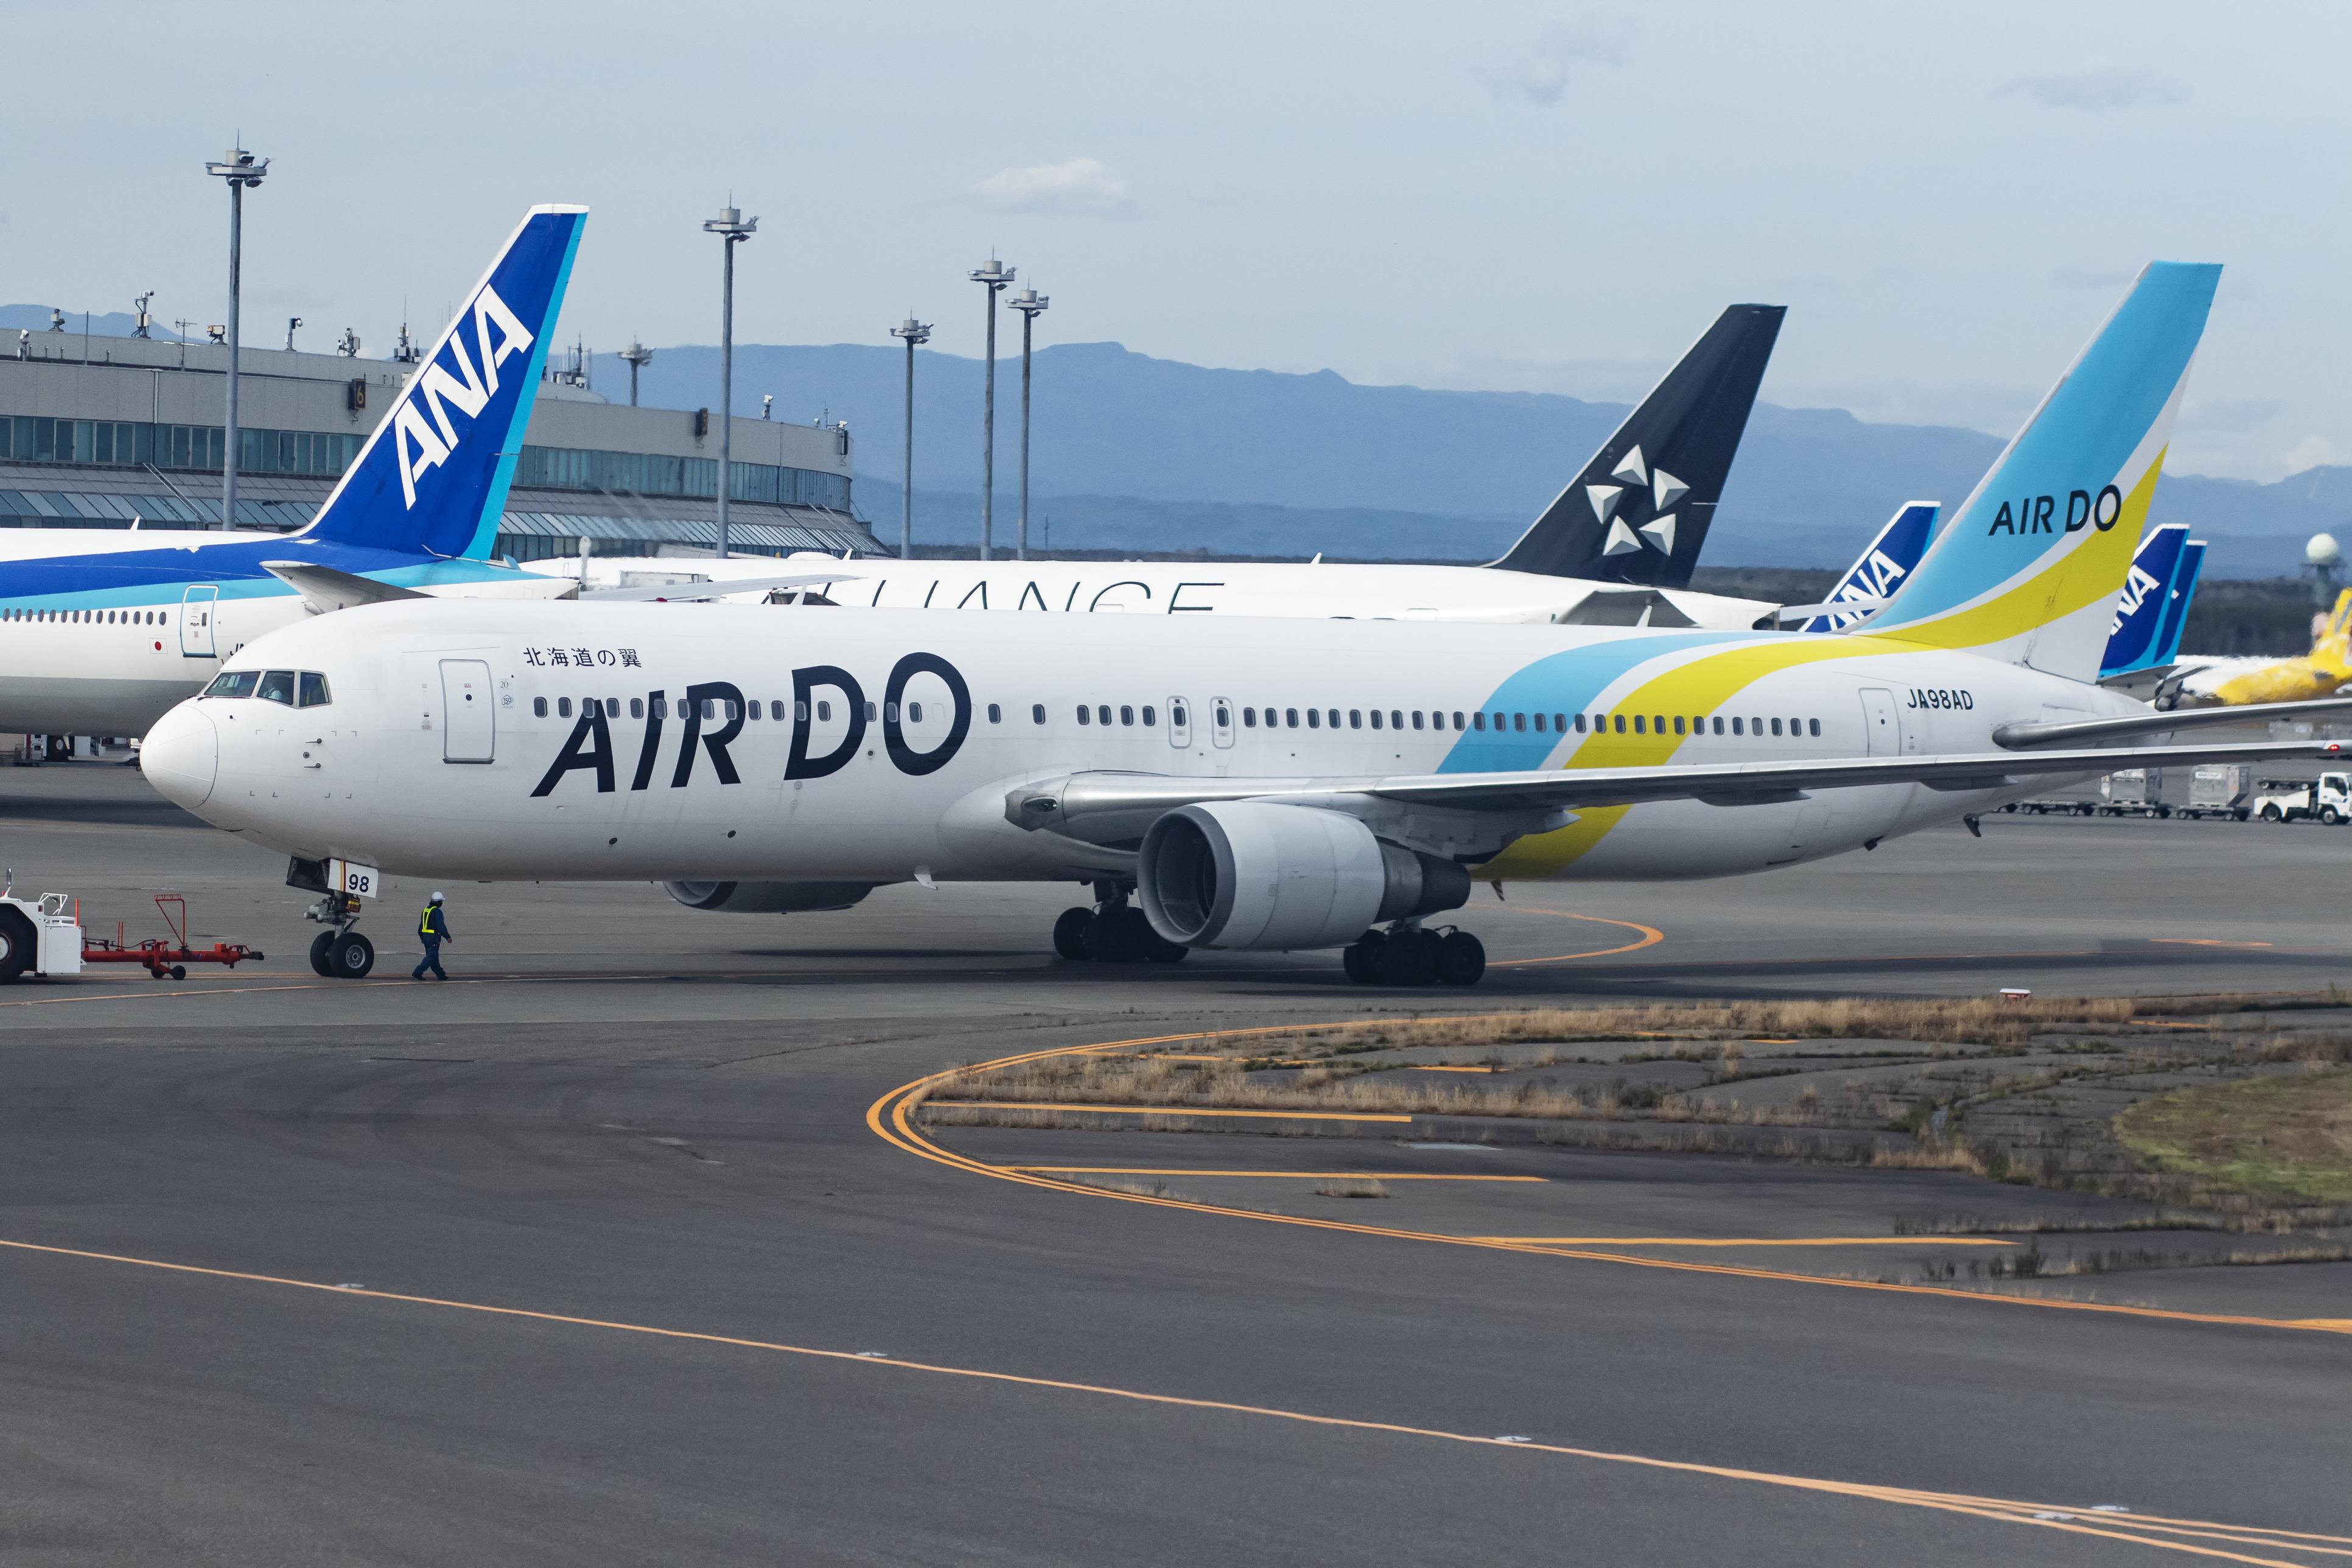 airdo plane in Japan